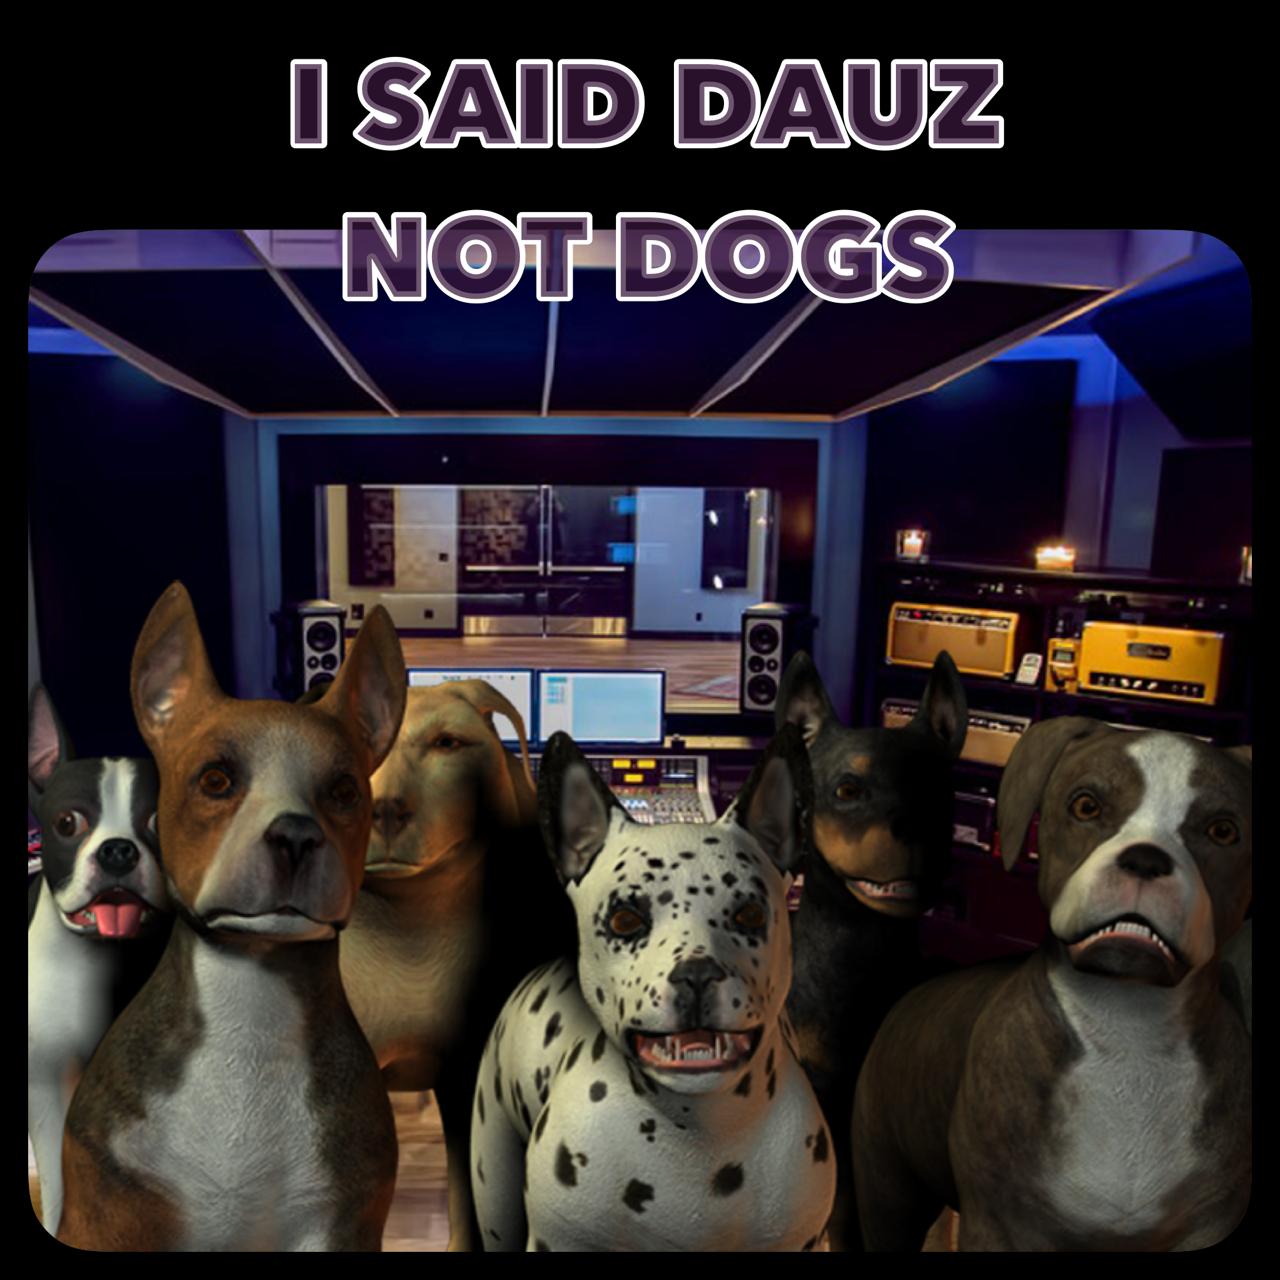 Dauz not Dogs